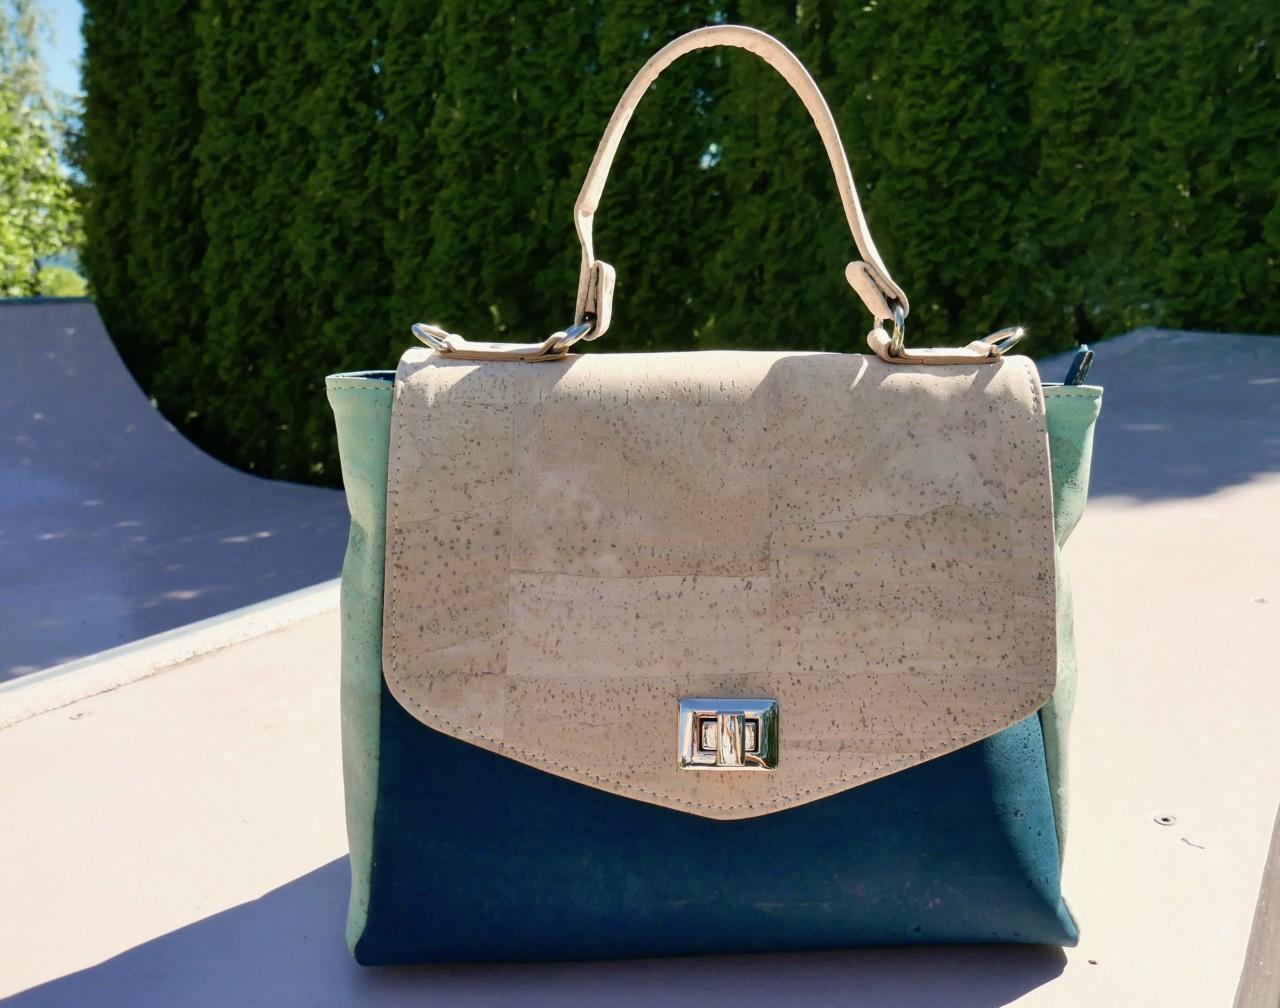 cork-leather-korkskinn-corkini-bag-sustainable-vegan-green-house